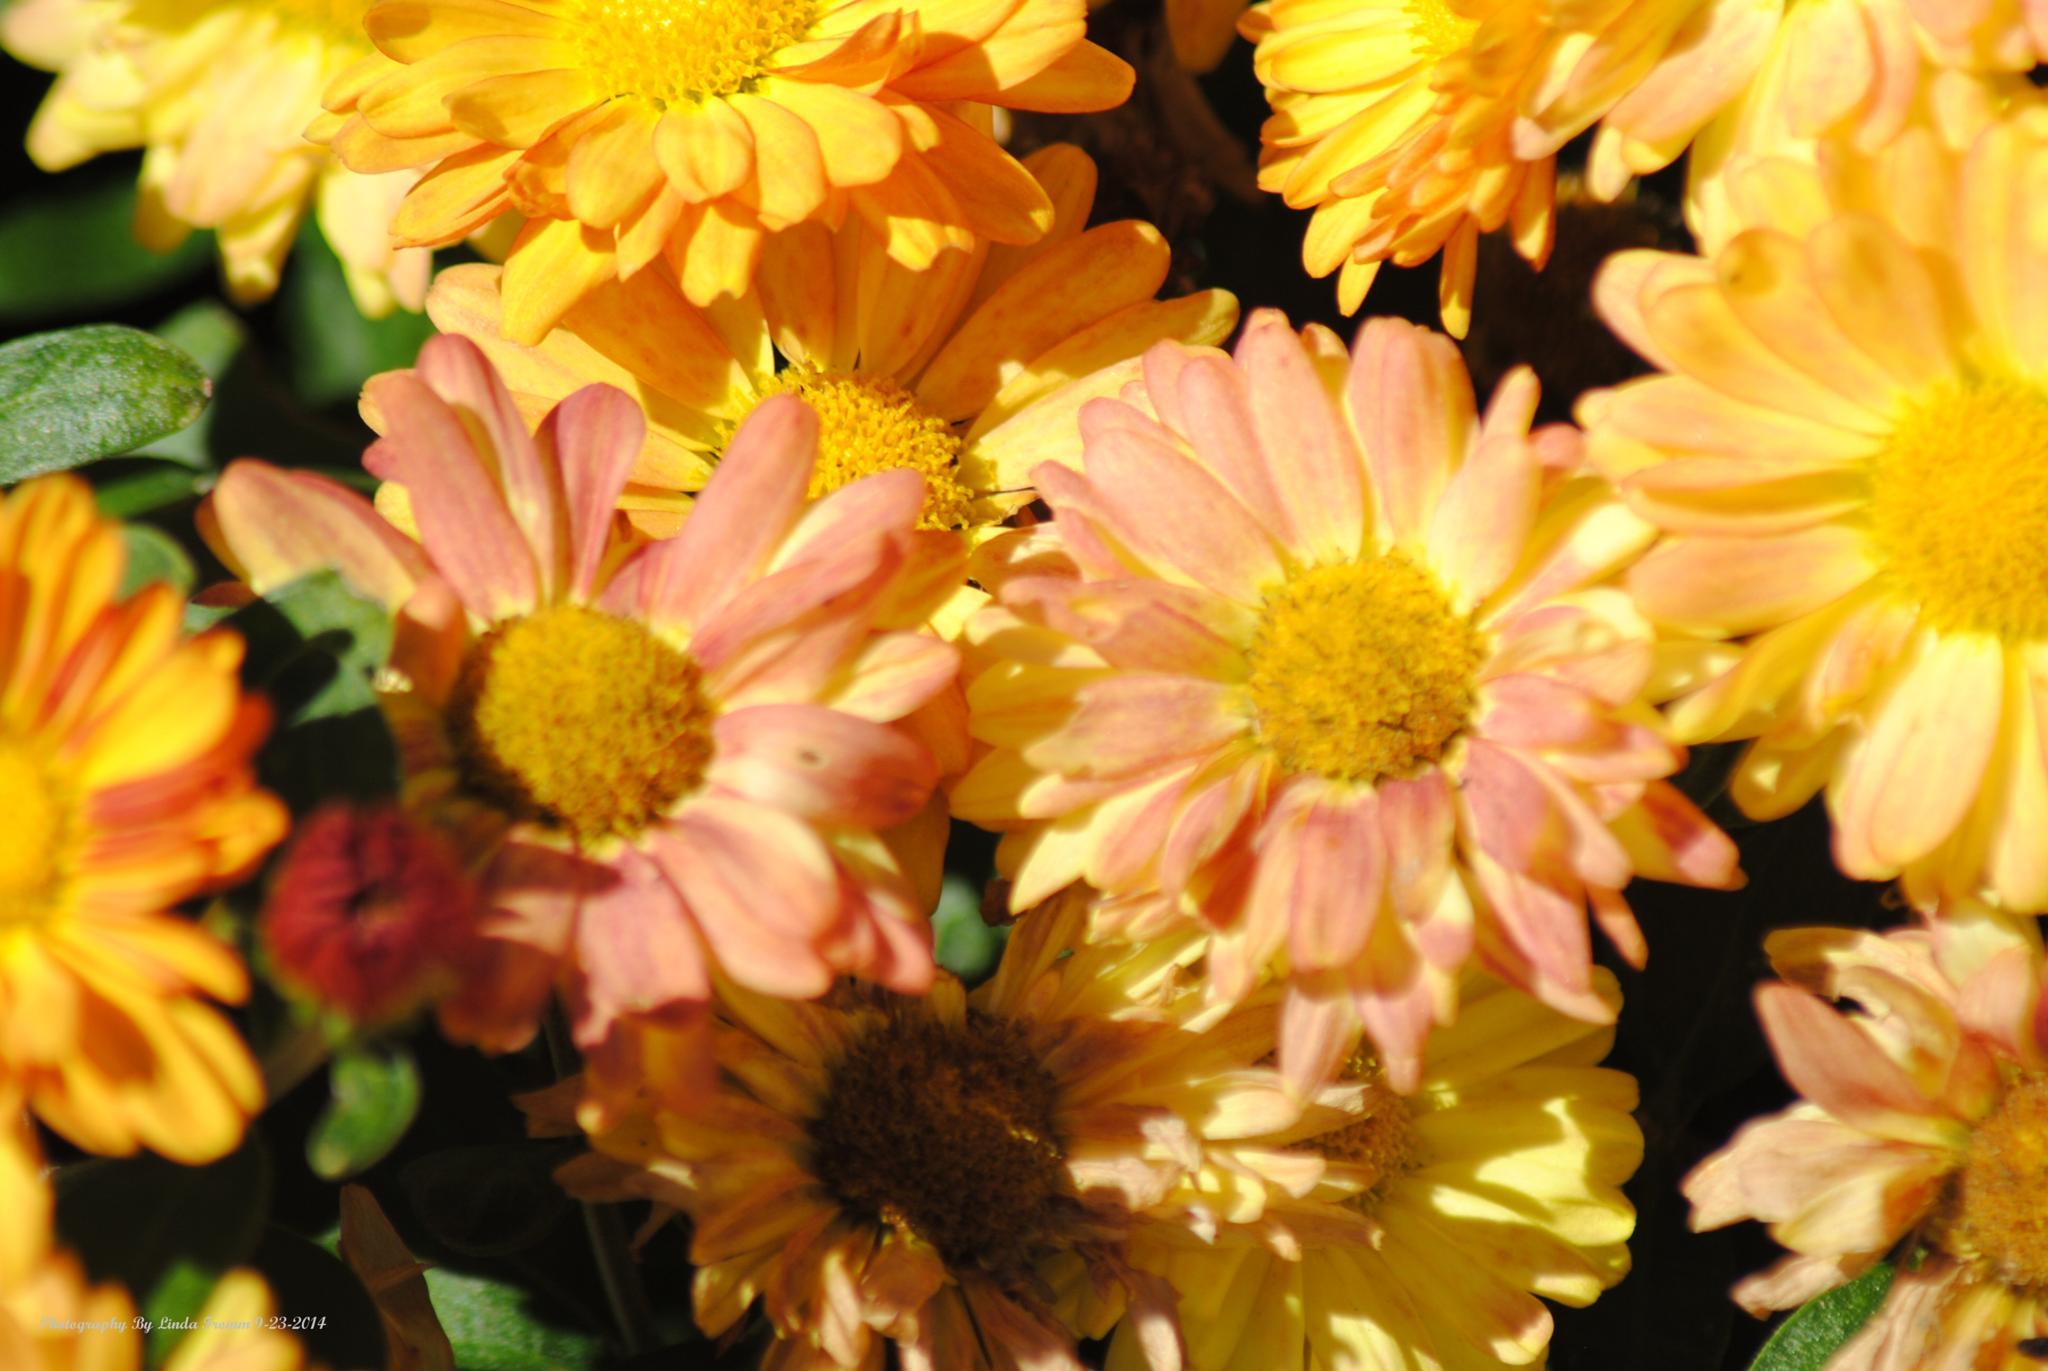 Columbiana asters by Linda Gifford